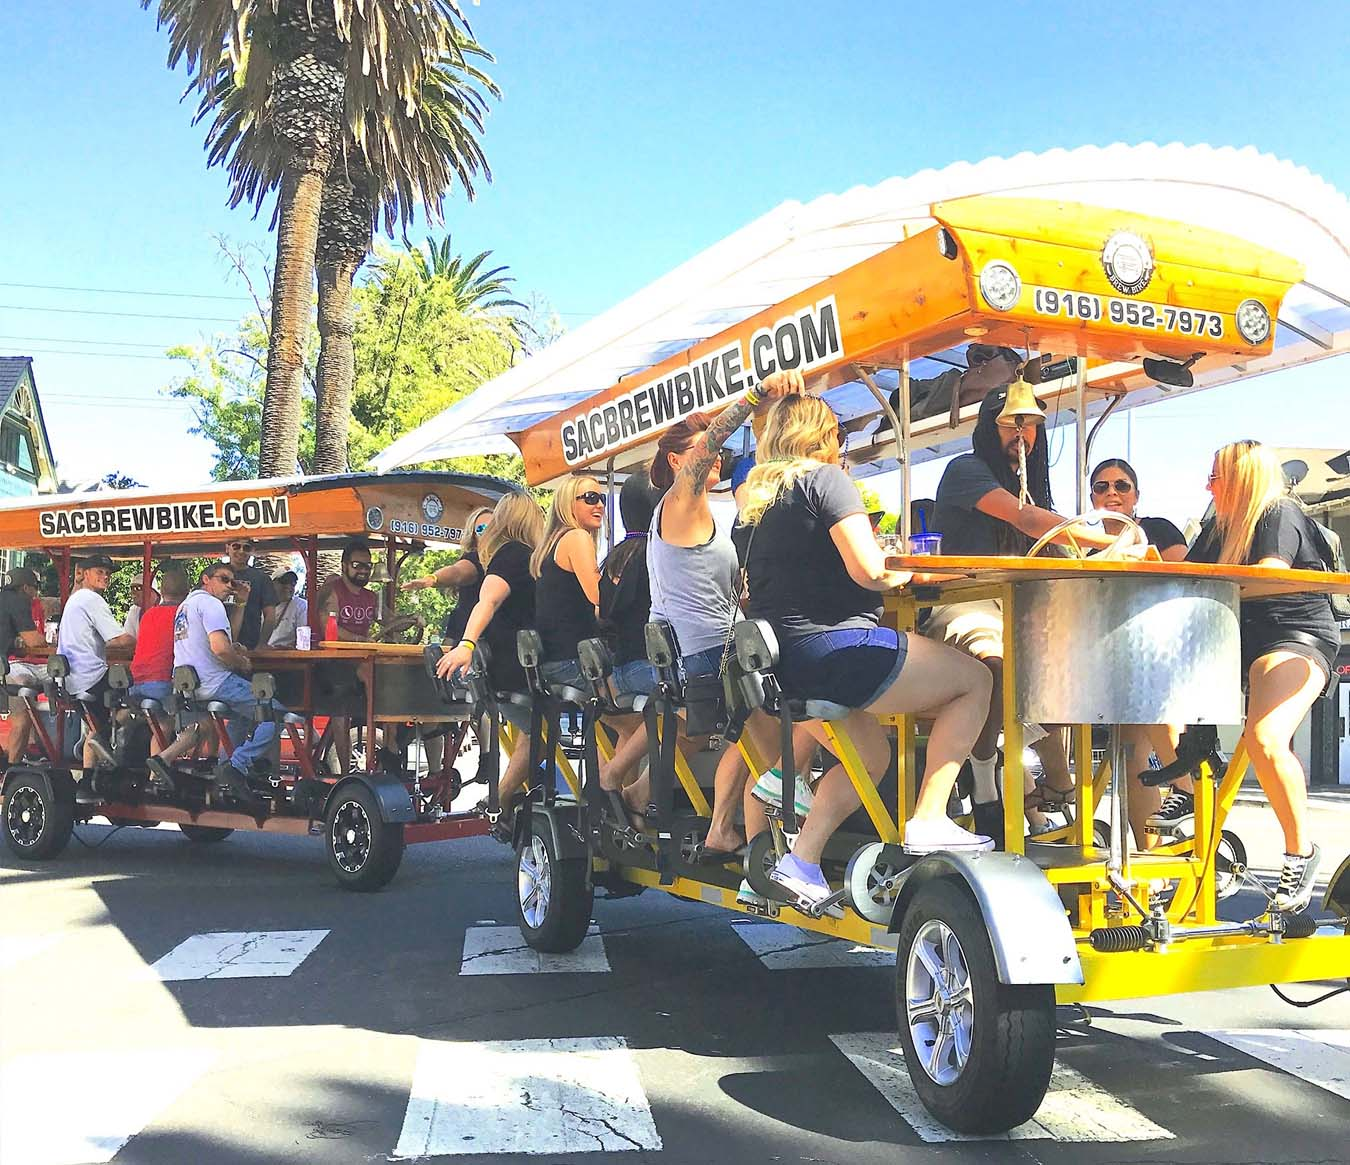 Things to Do in Sacramento - Sac Brew Bike